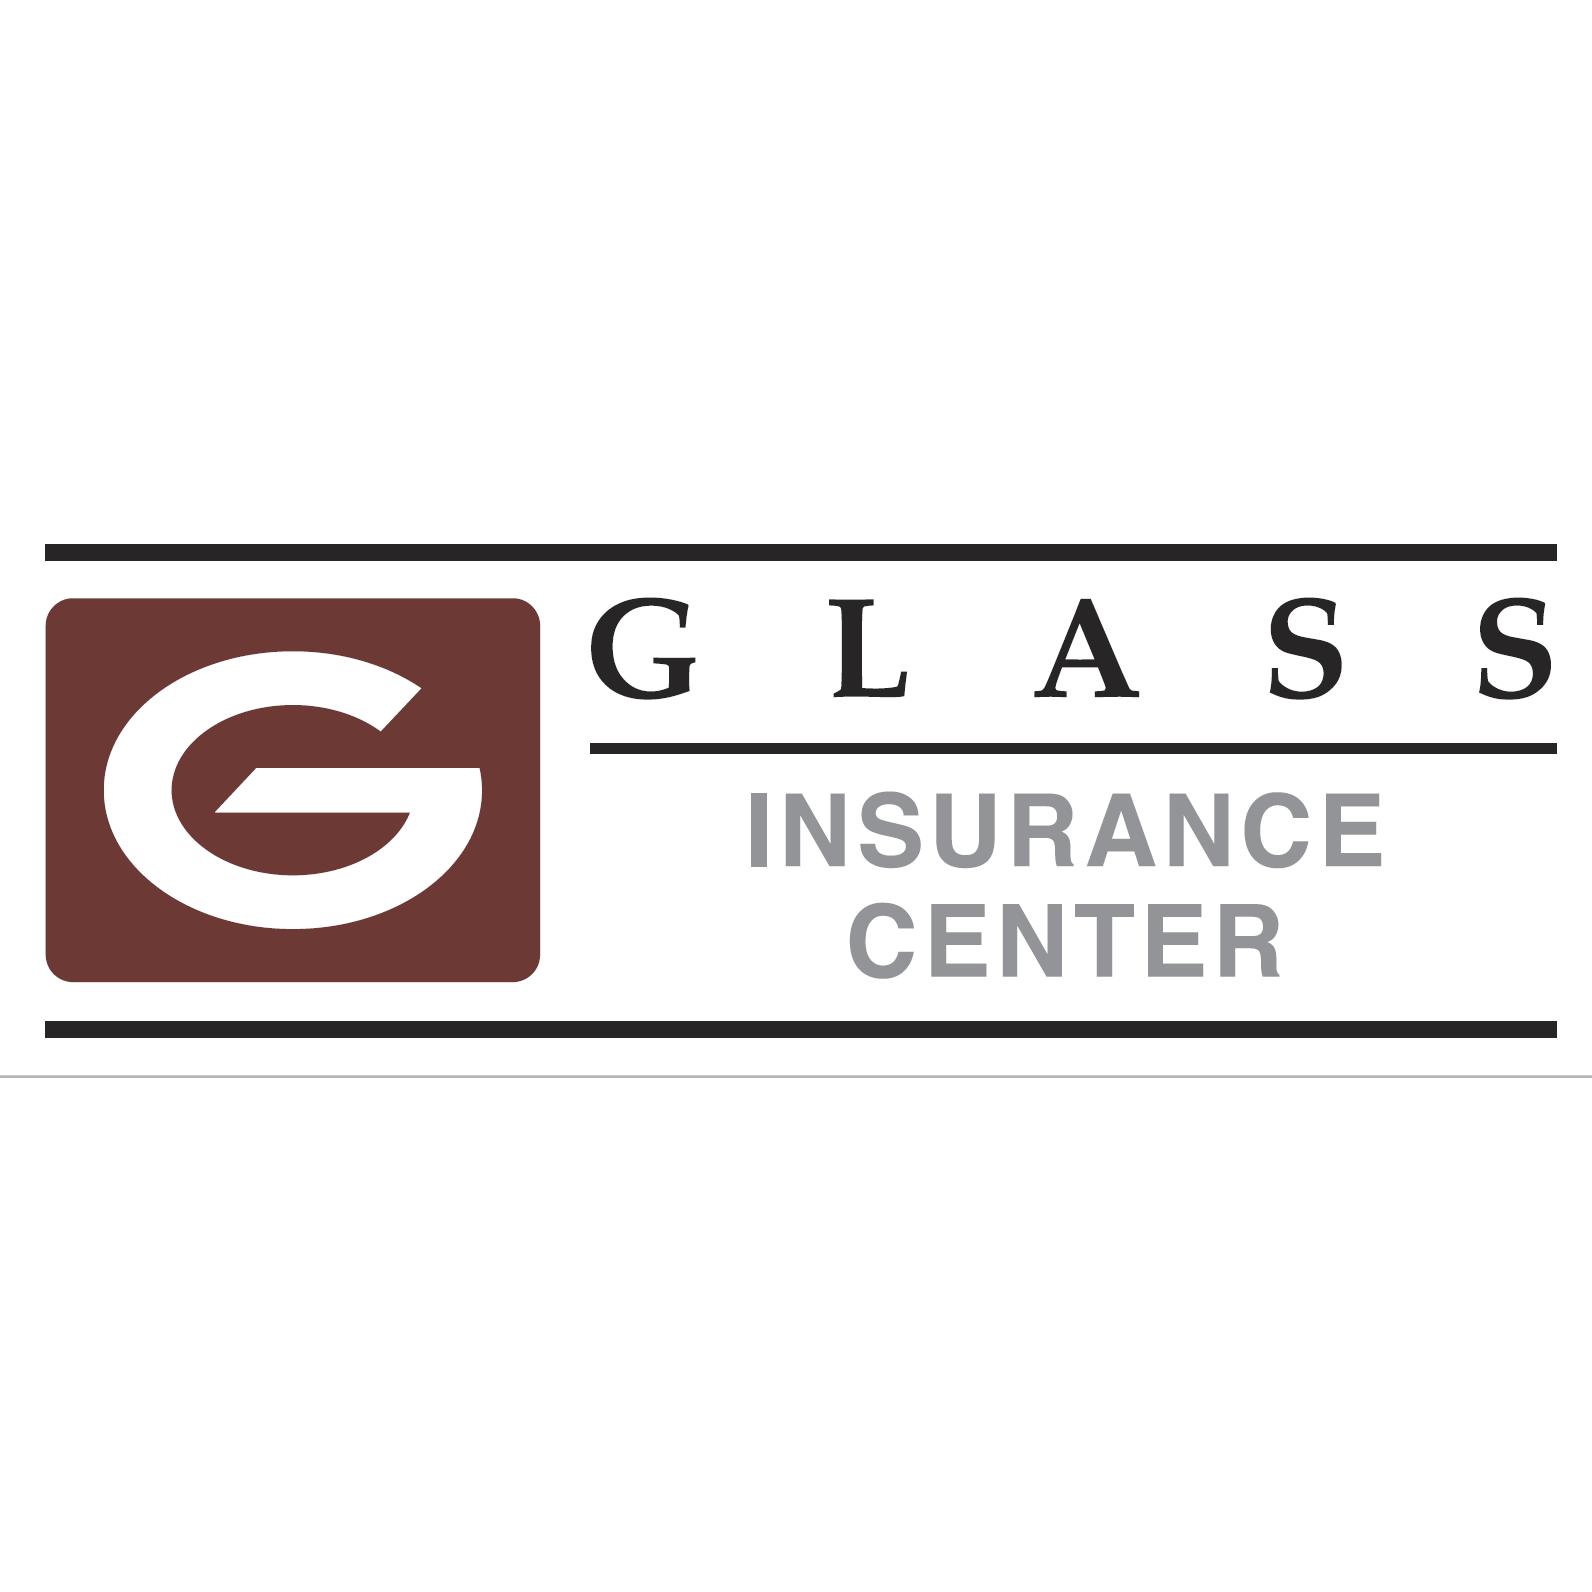 Glass Insurance Center - Lake Geneva, WI - Insurance Agents